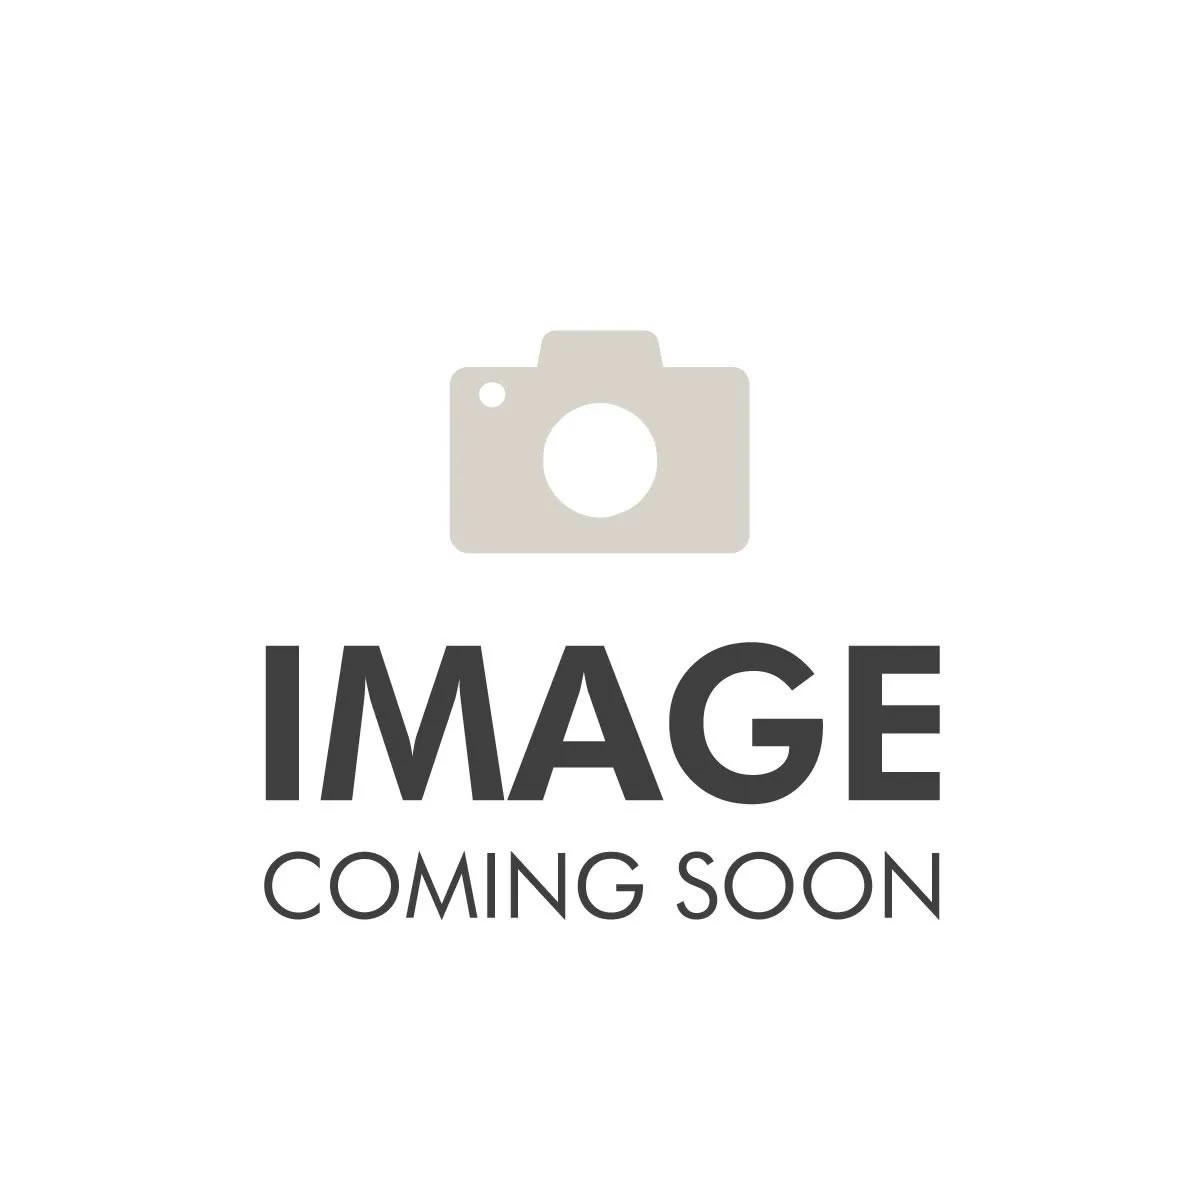 Blower Motor Resistor; 07-10 Jeep Wrangler JK